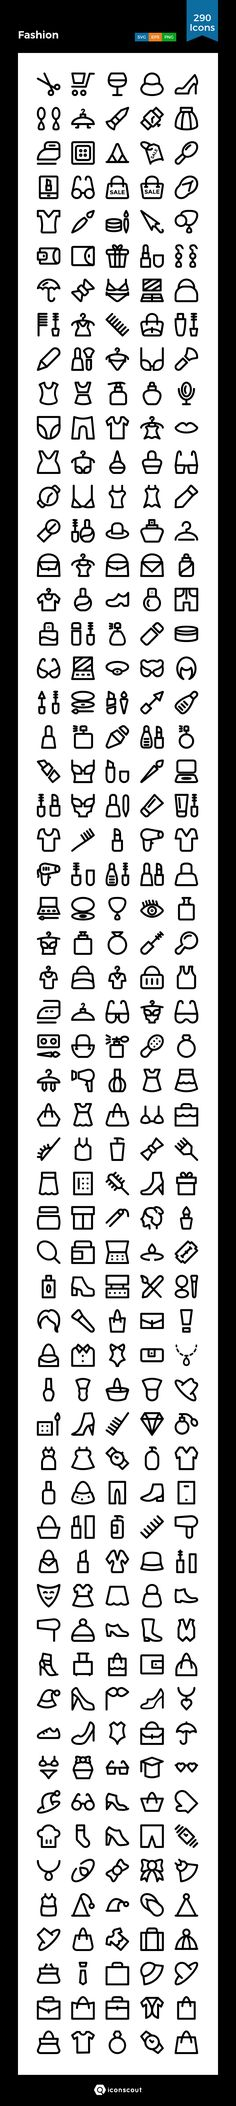 Fashion   Icon Pack - 290 Line Icons